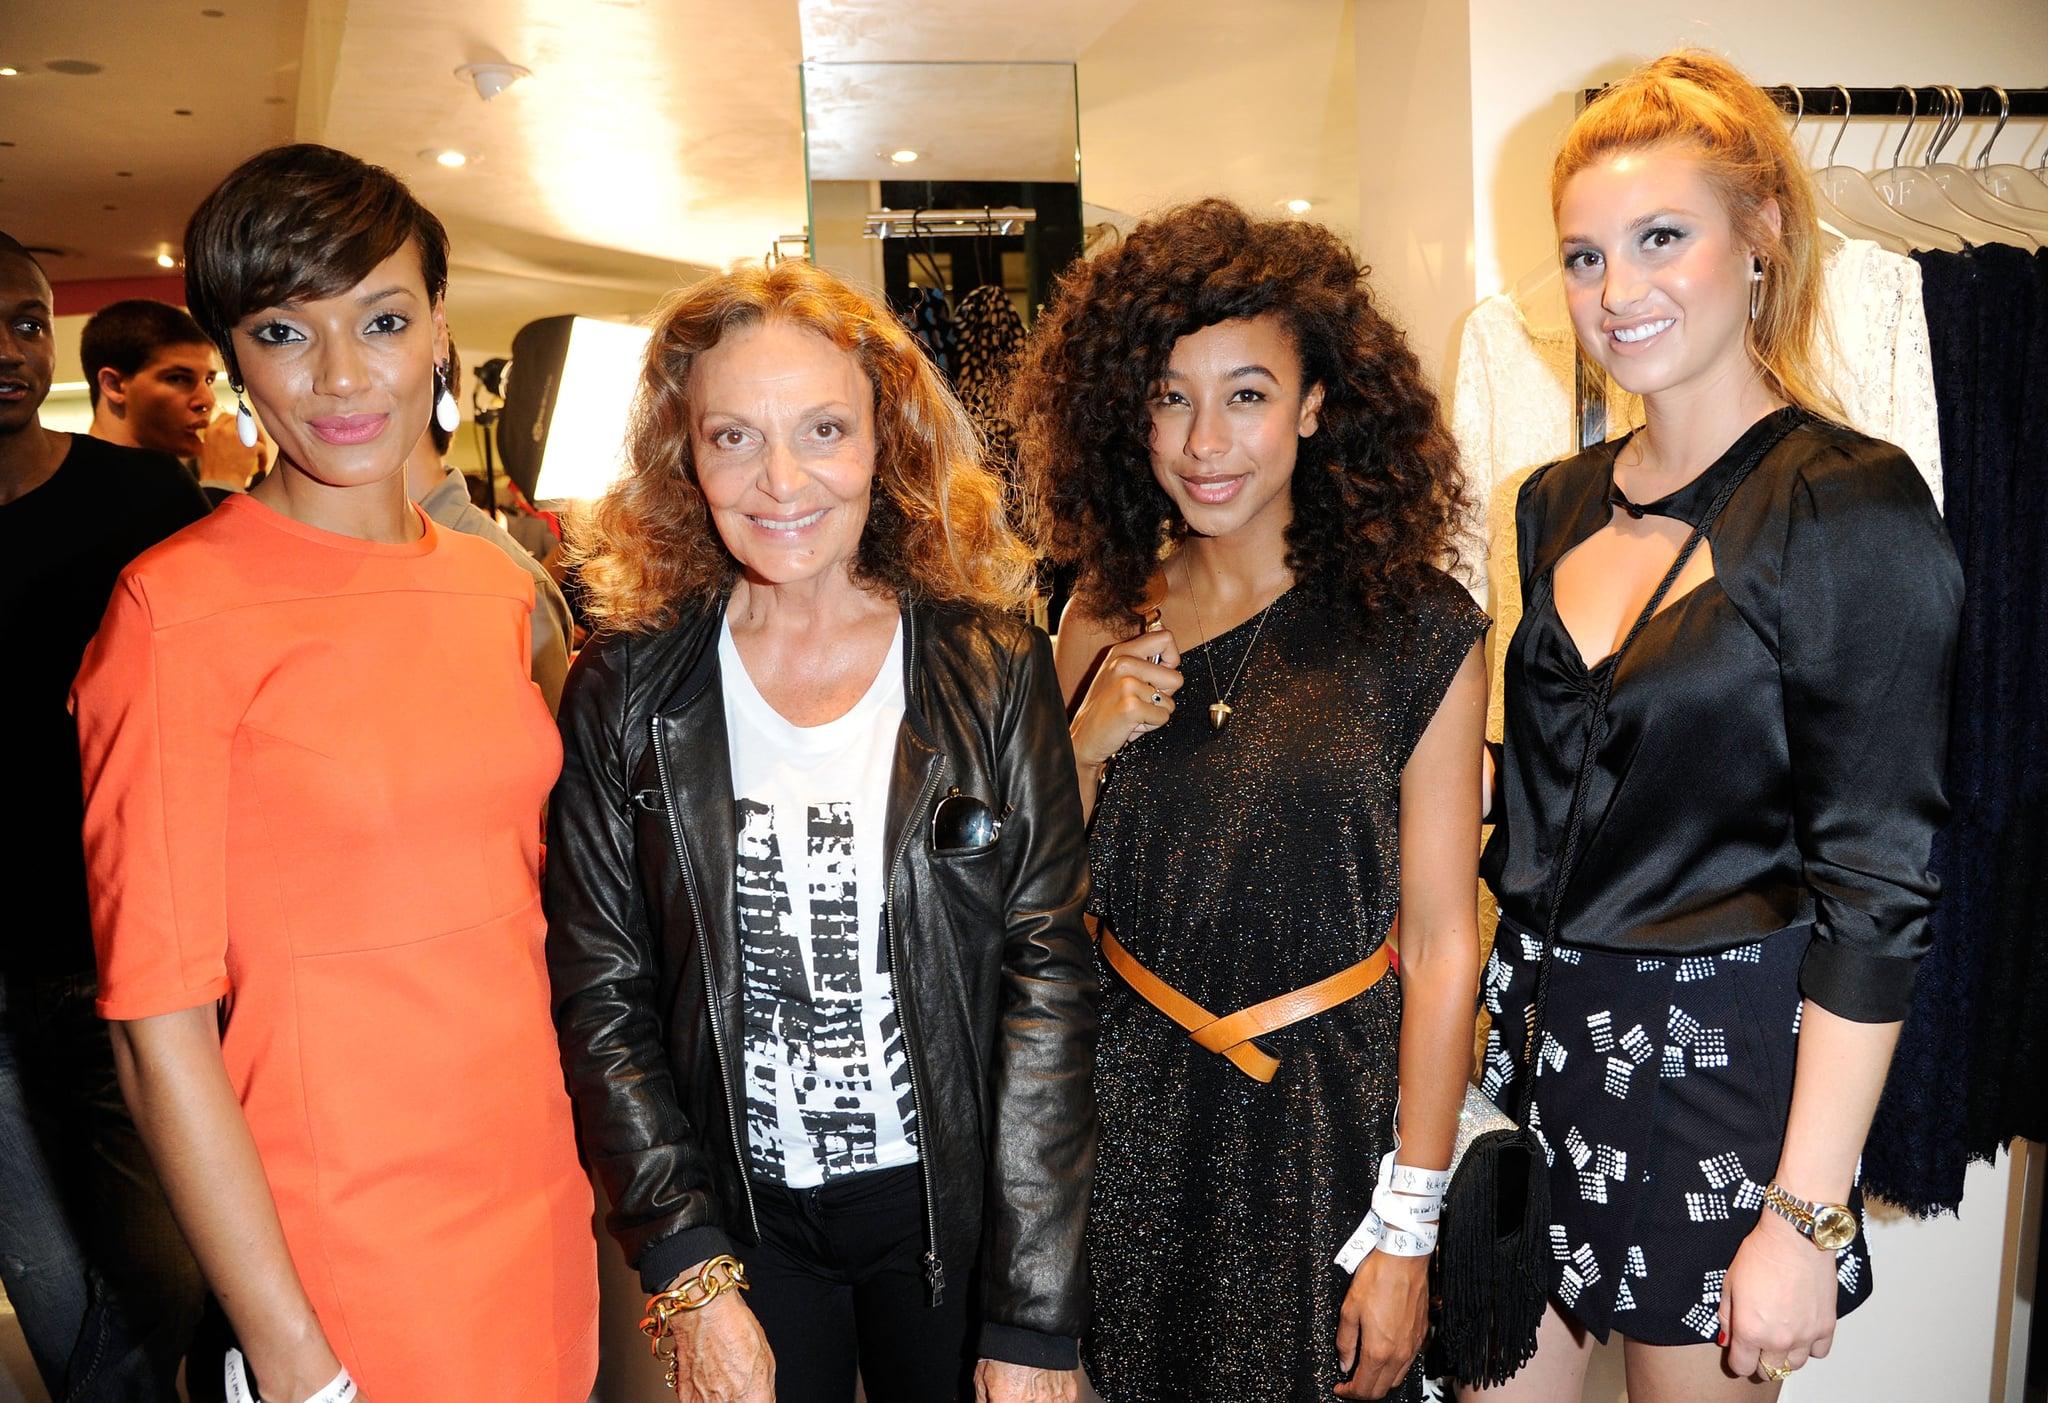 Selita Ebanks and Whitney Port joined Diane von Furstenberg on Fashion's Night Out.